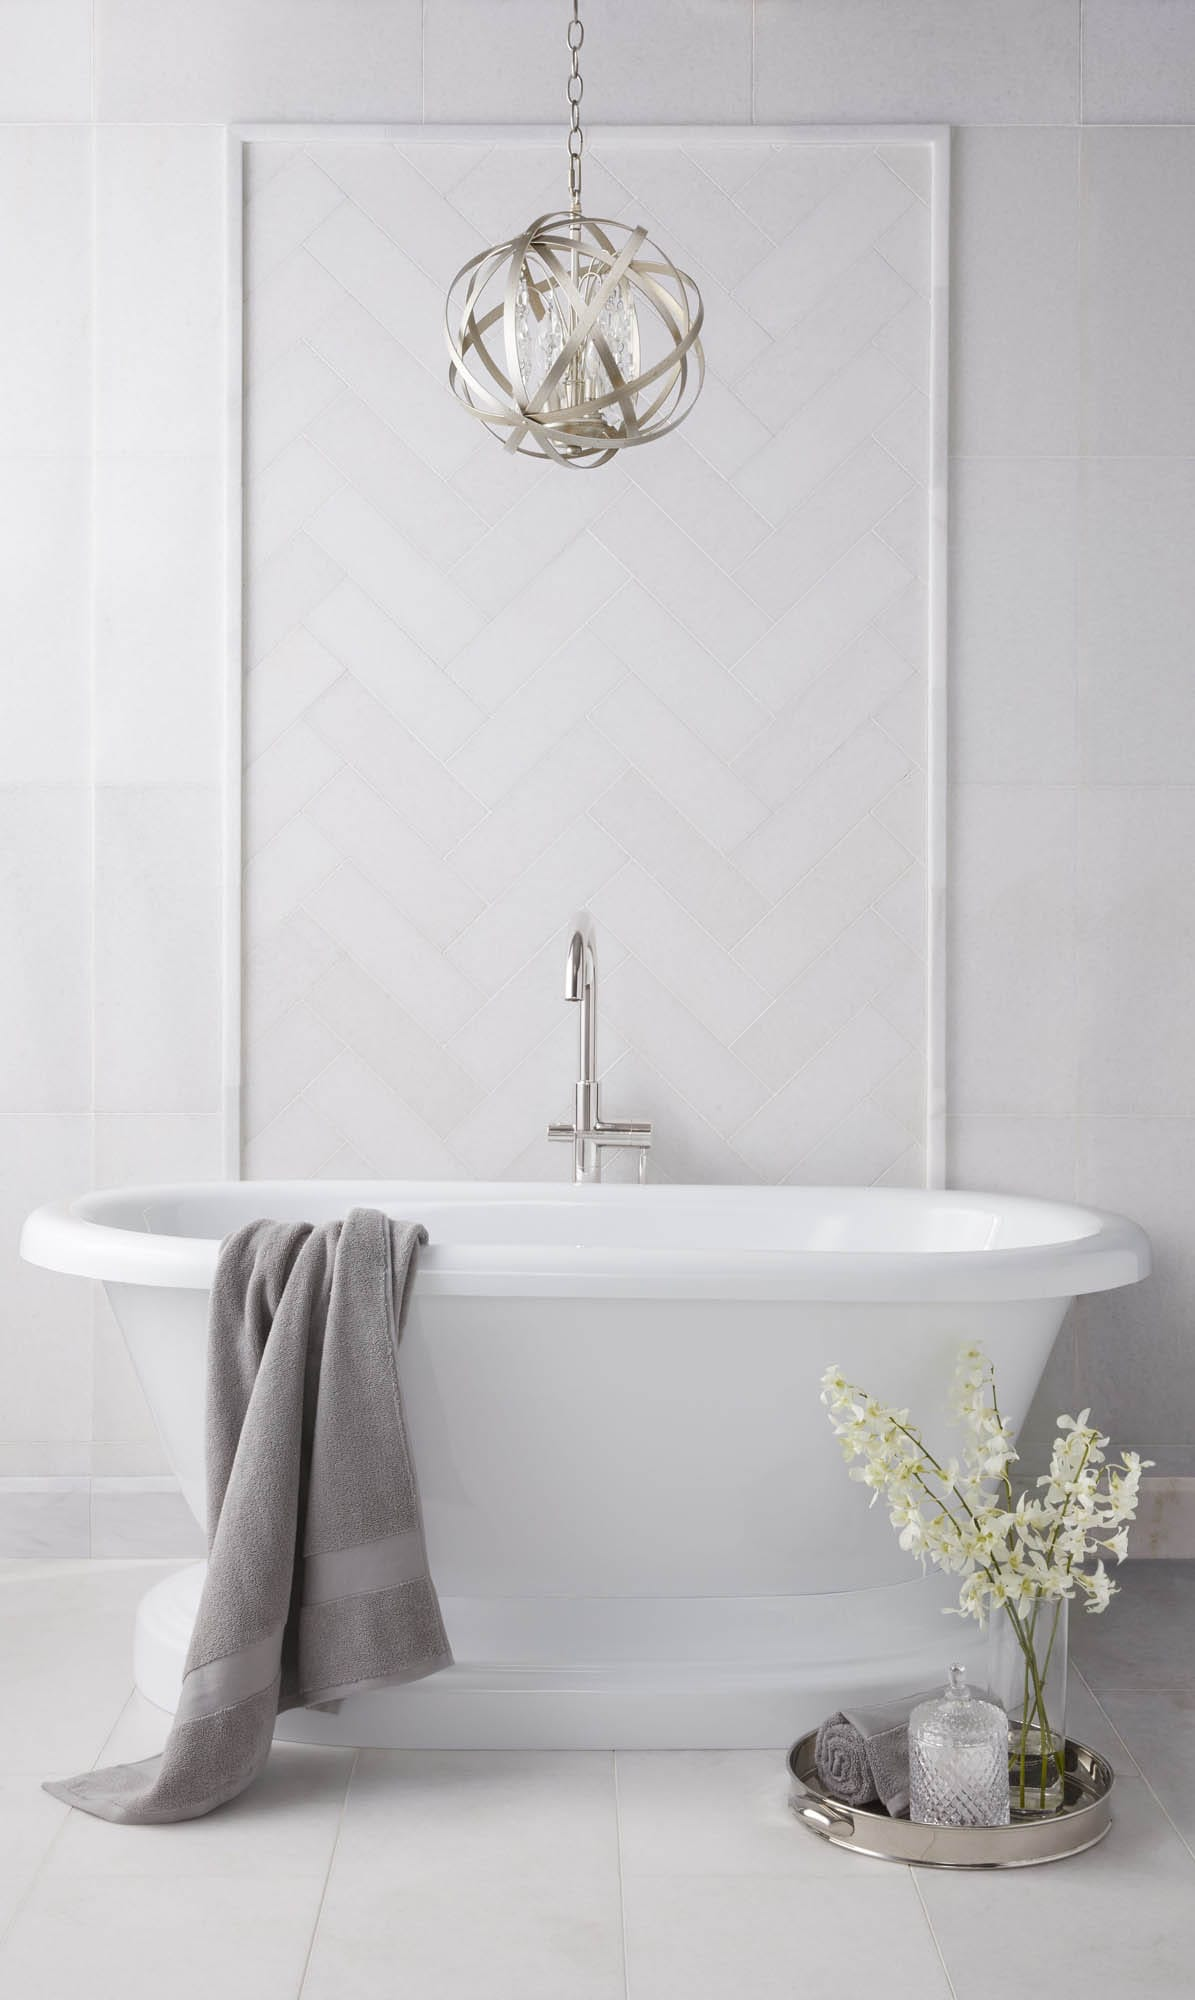 Honed white marble and bathtub